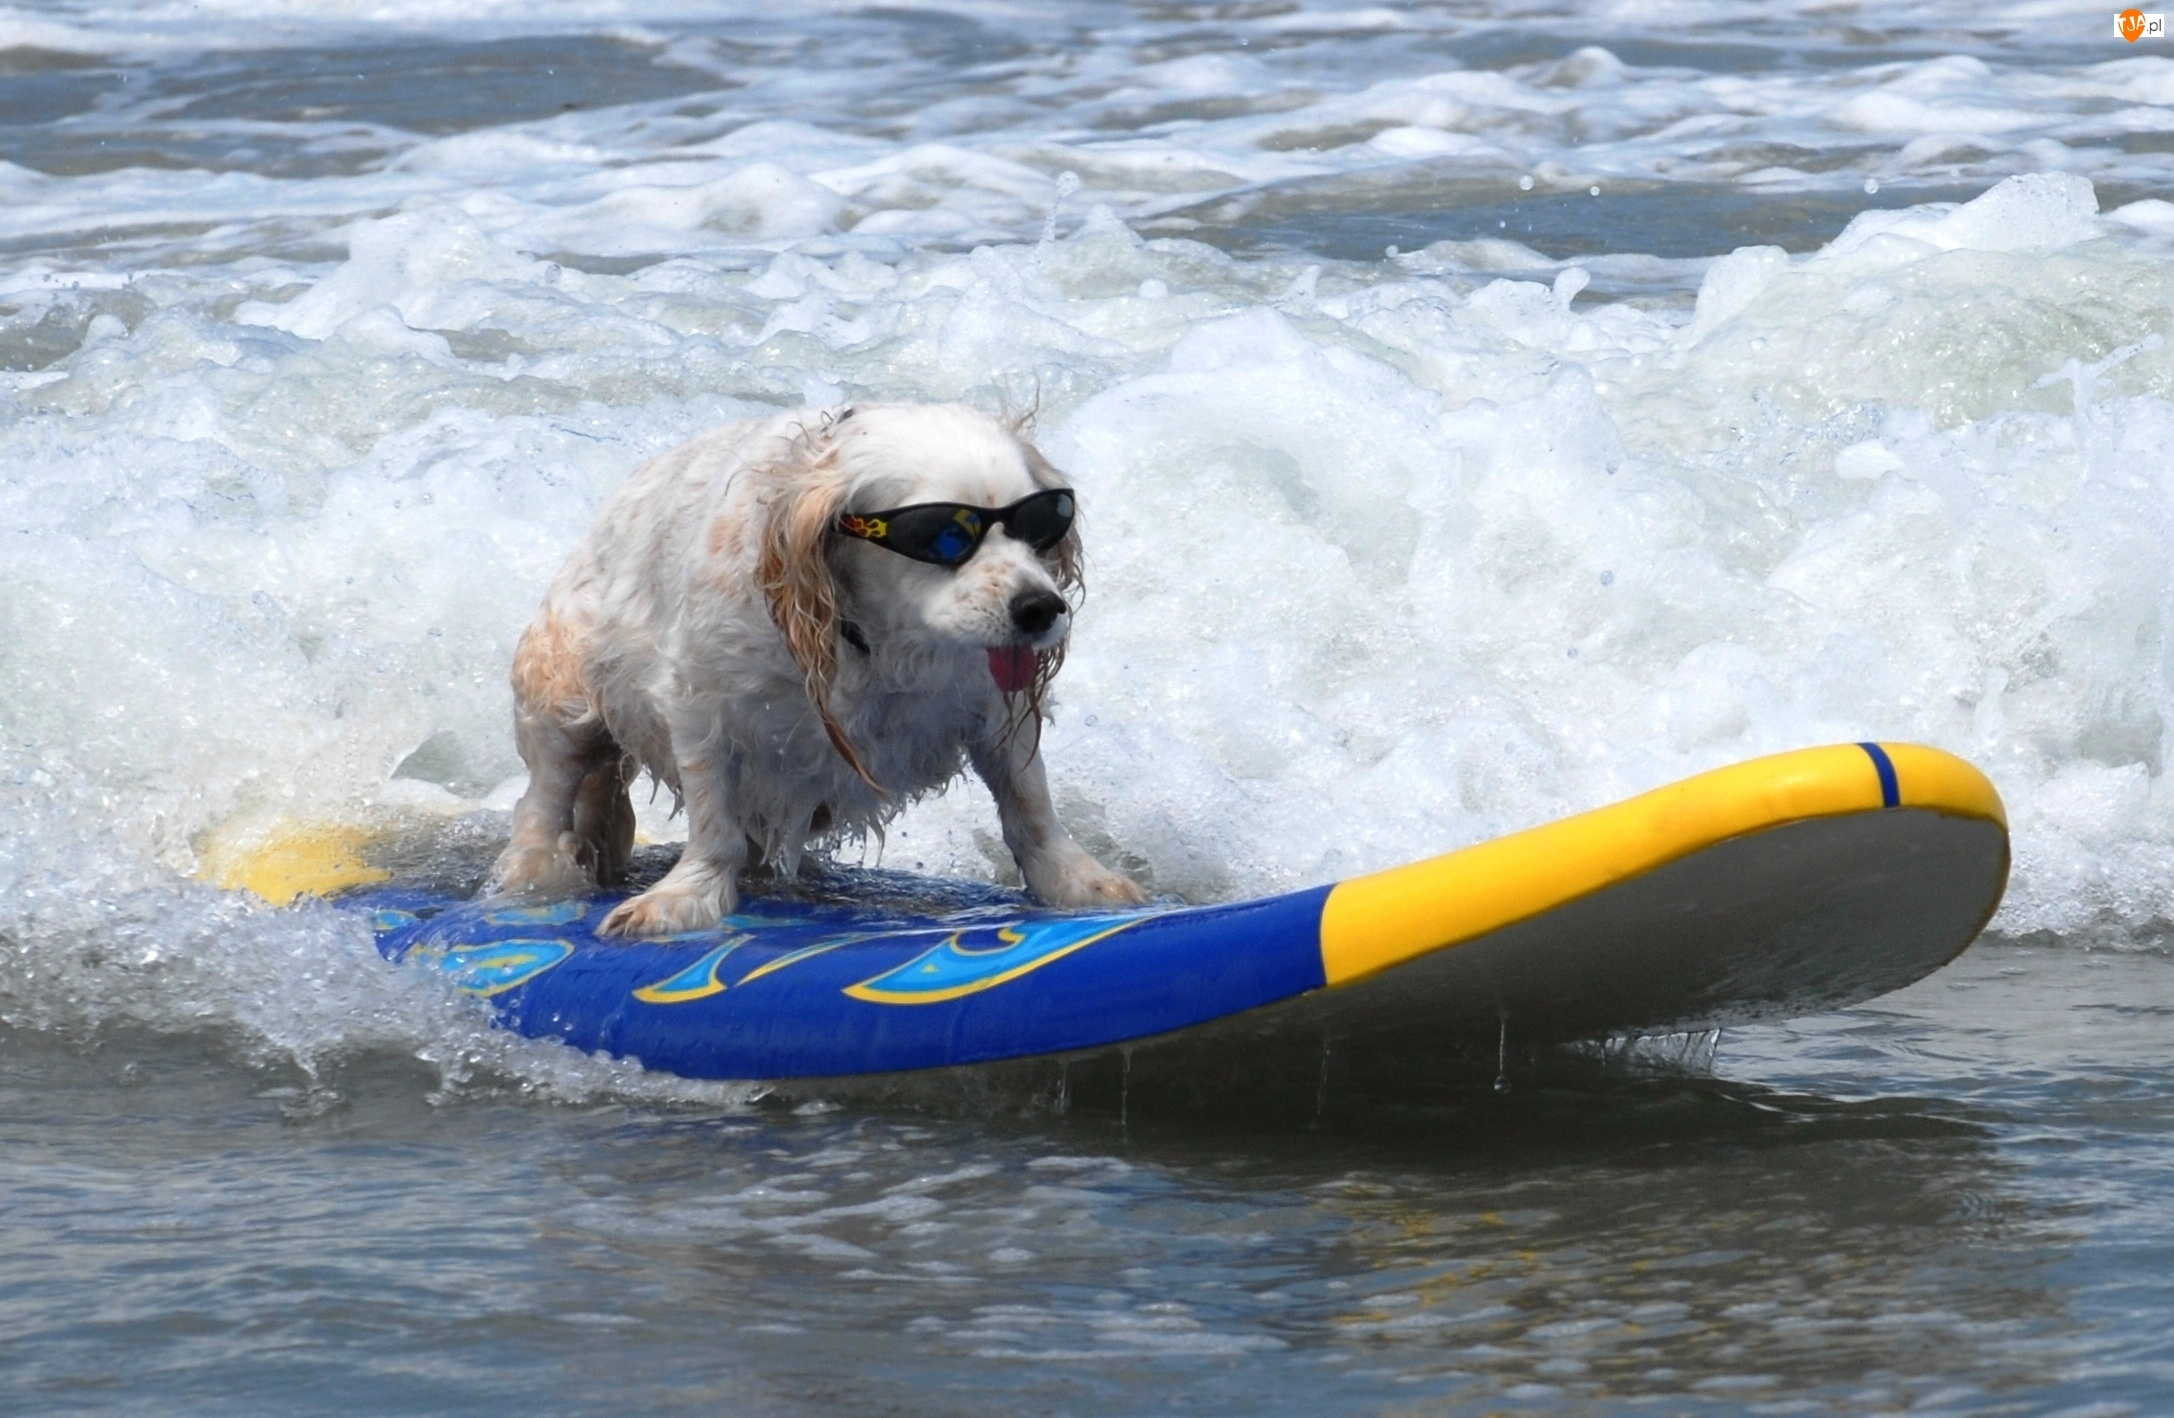 Piesek, Surfing, Okulary, Morze